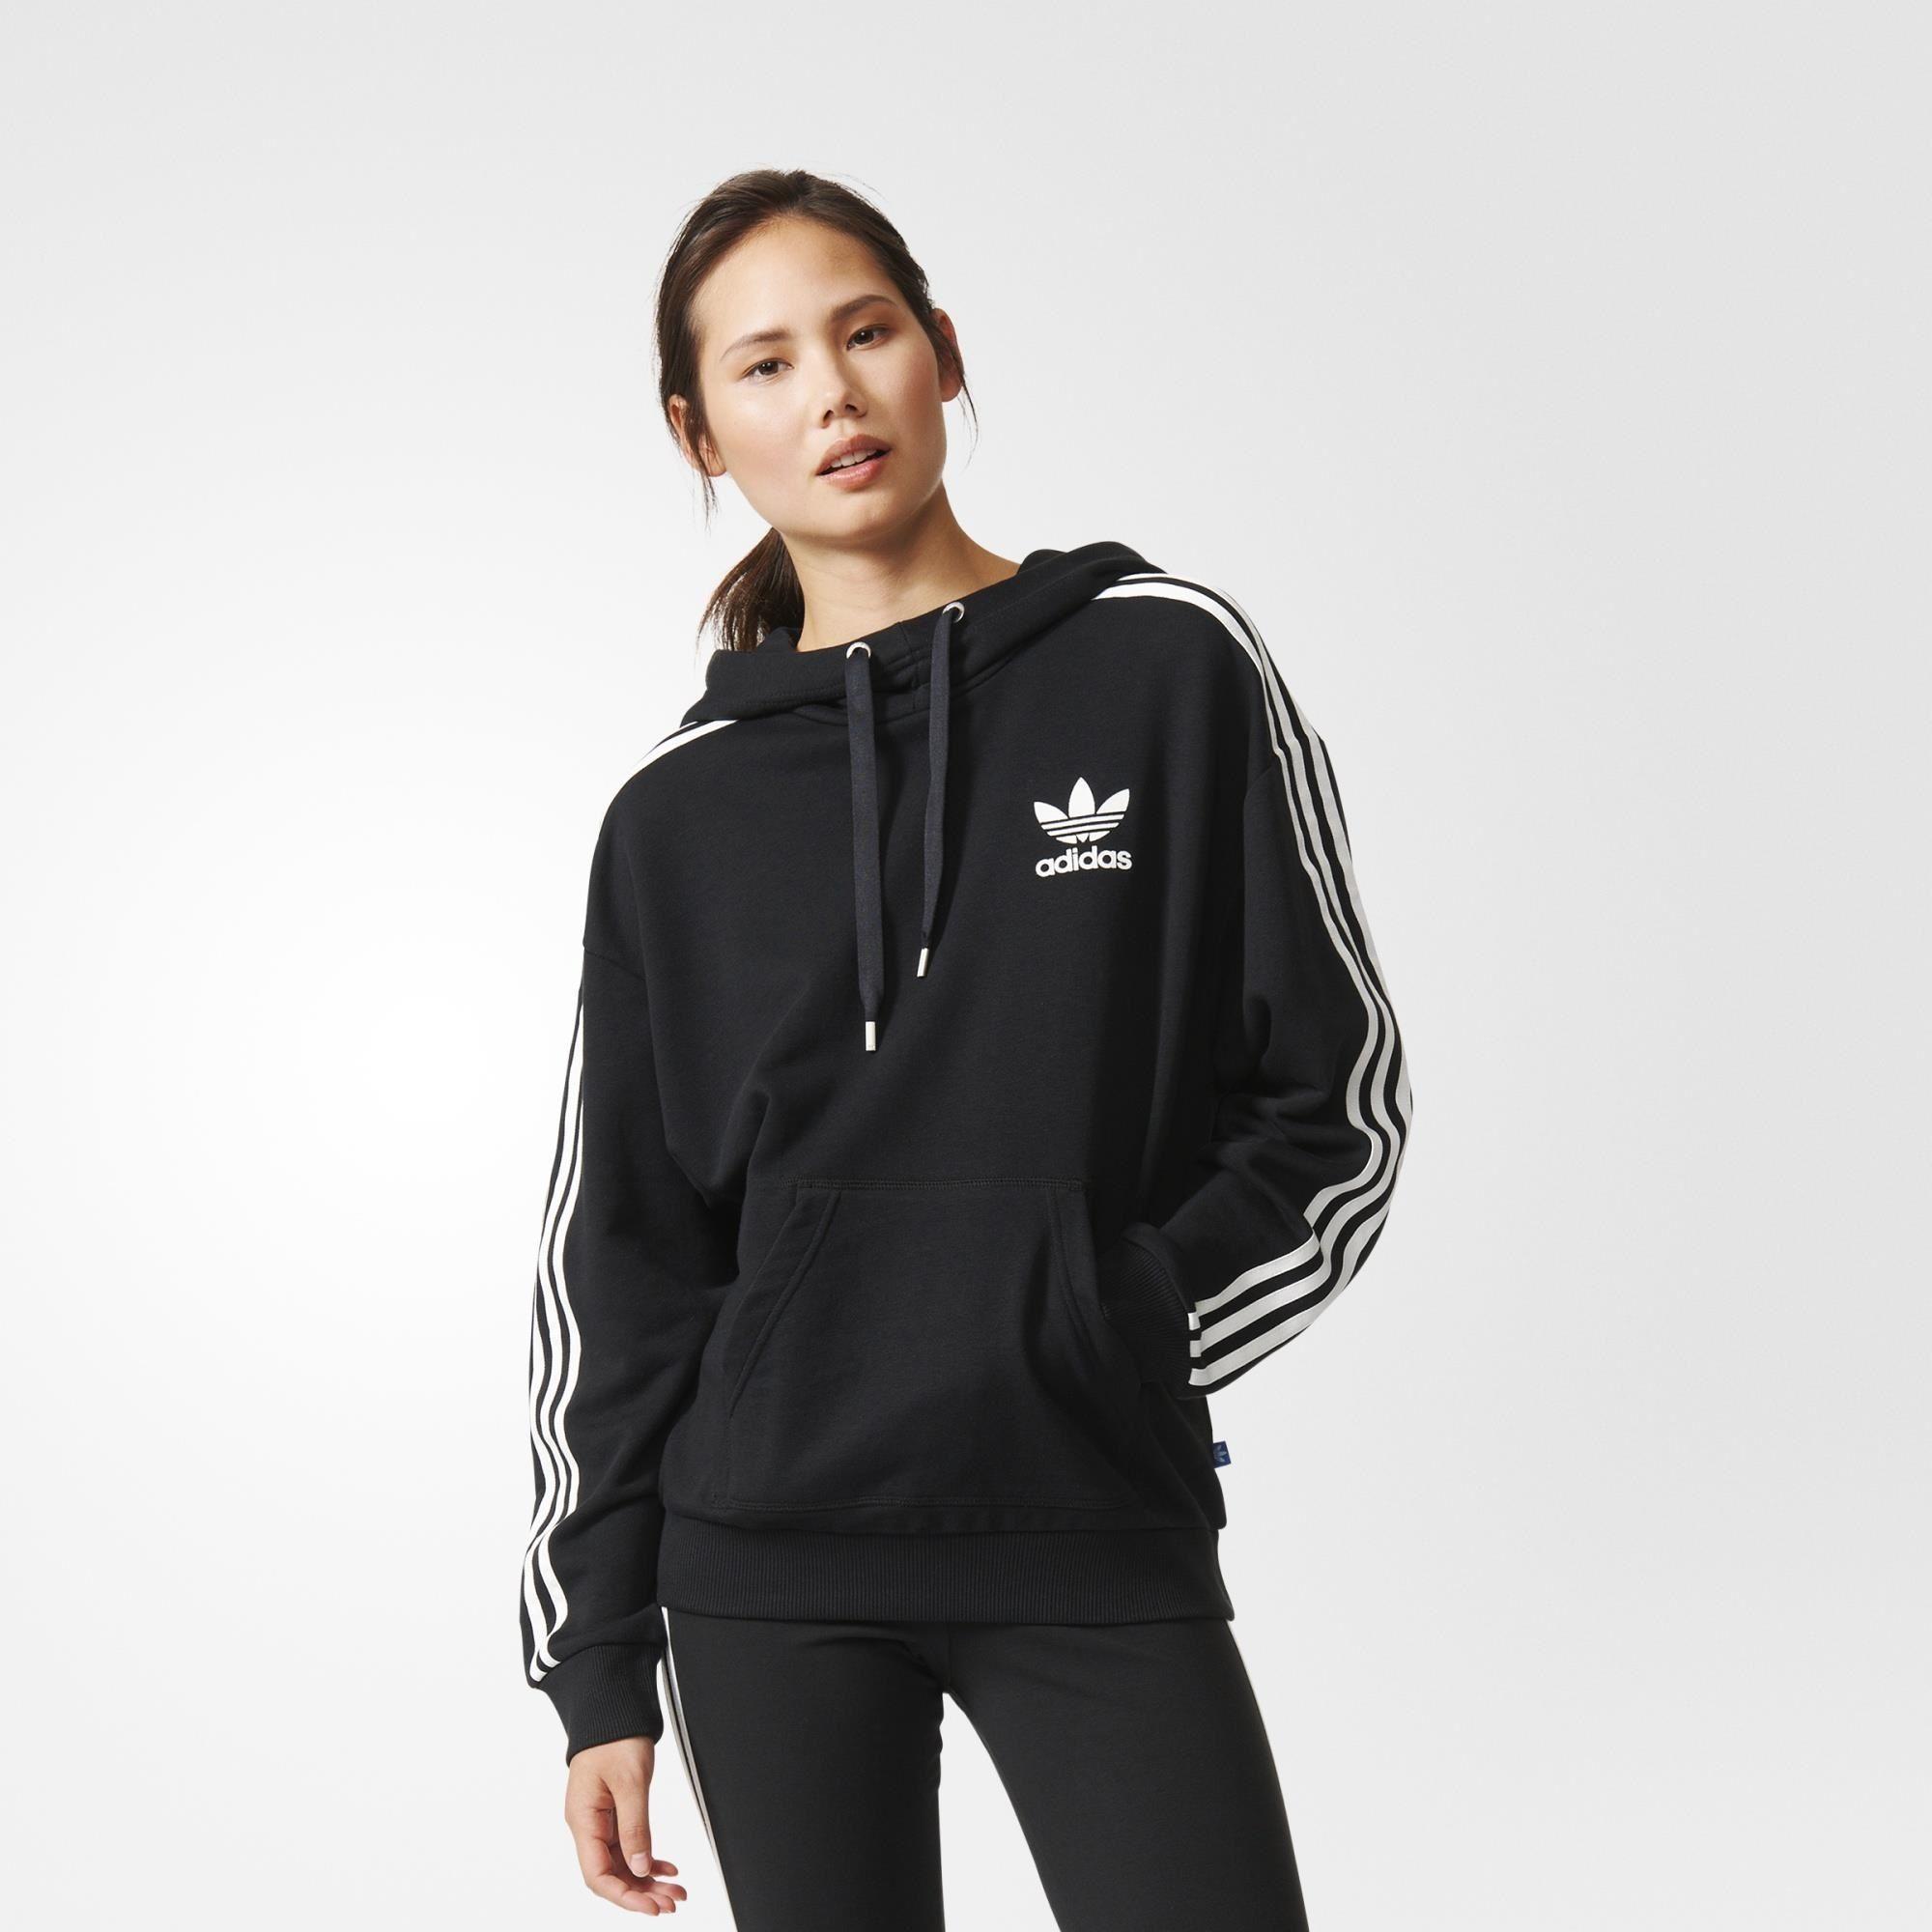 adidas 3-Stripes Hoodie - Black  b87a40d39f5